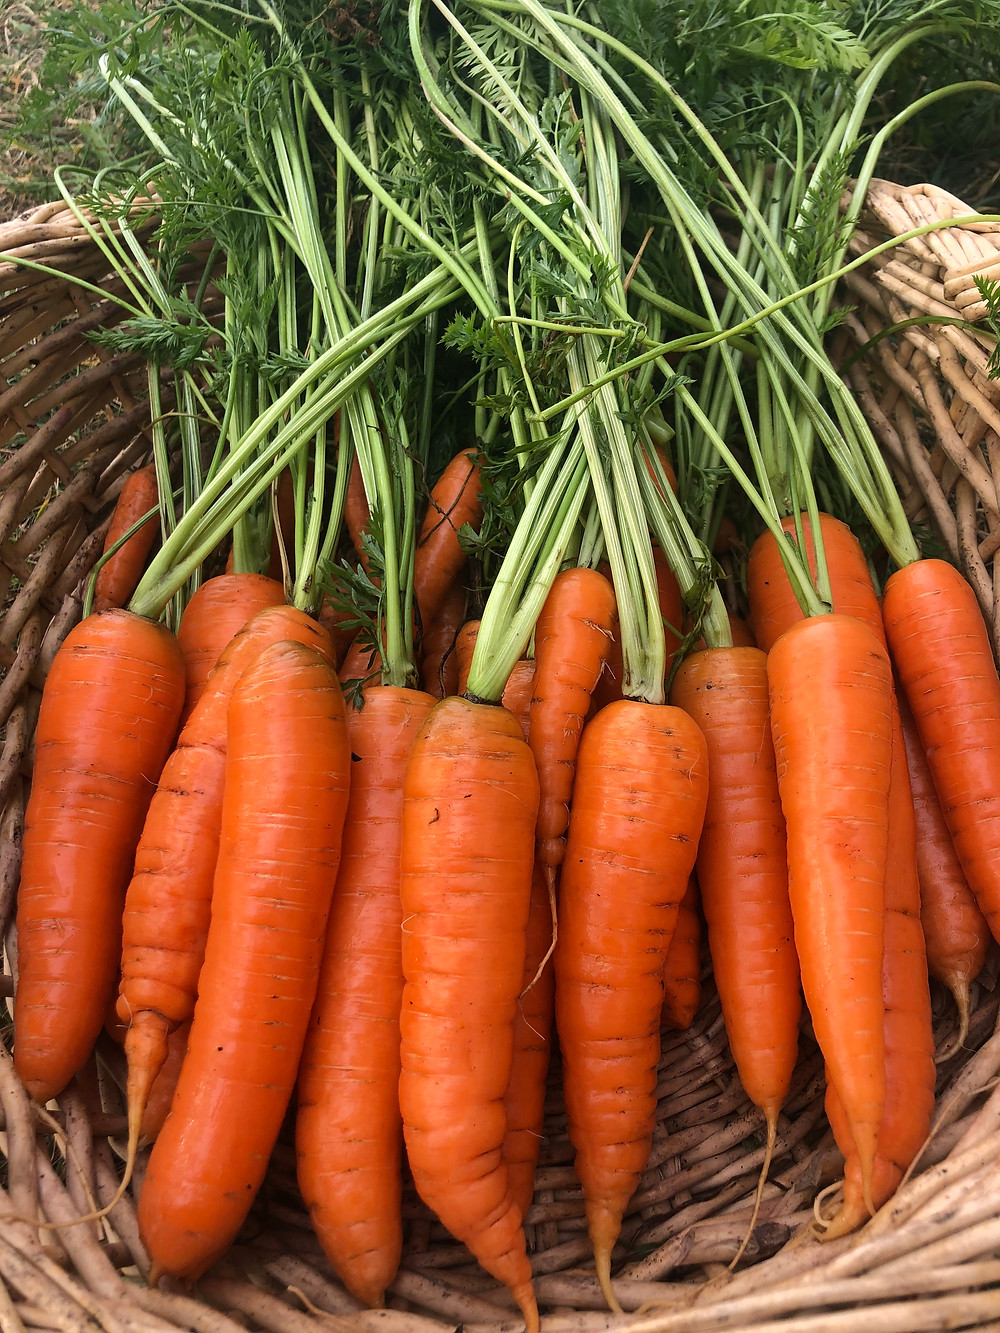 Bright orange fresh garden carrots in a basket, grown in a backyard, raised bed garden in growing zone 3 of Alberta, Canada.